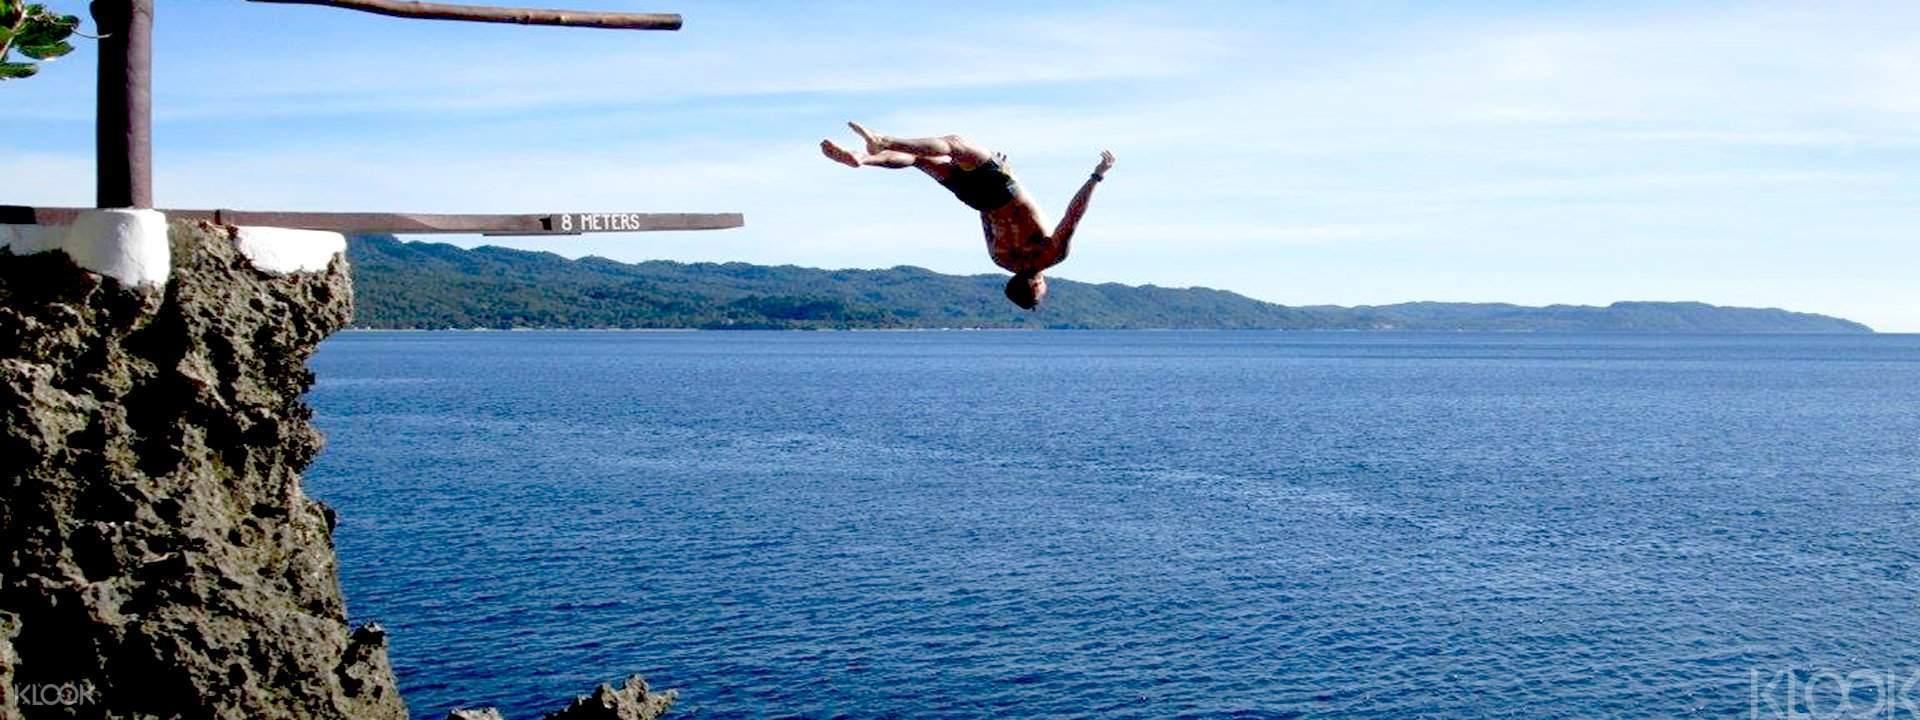 "Ariel's Point Cliff Diving"""